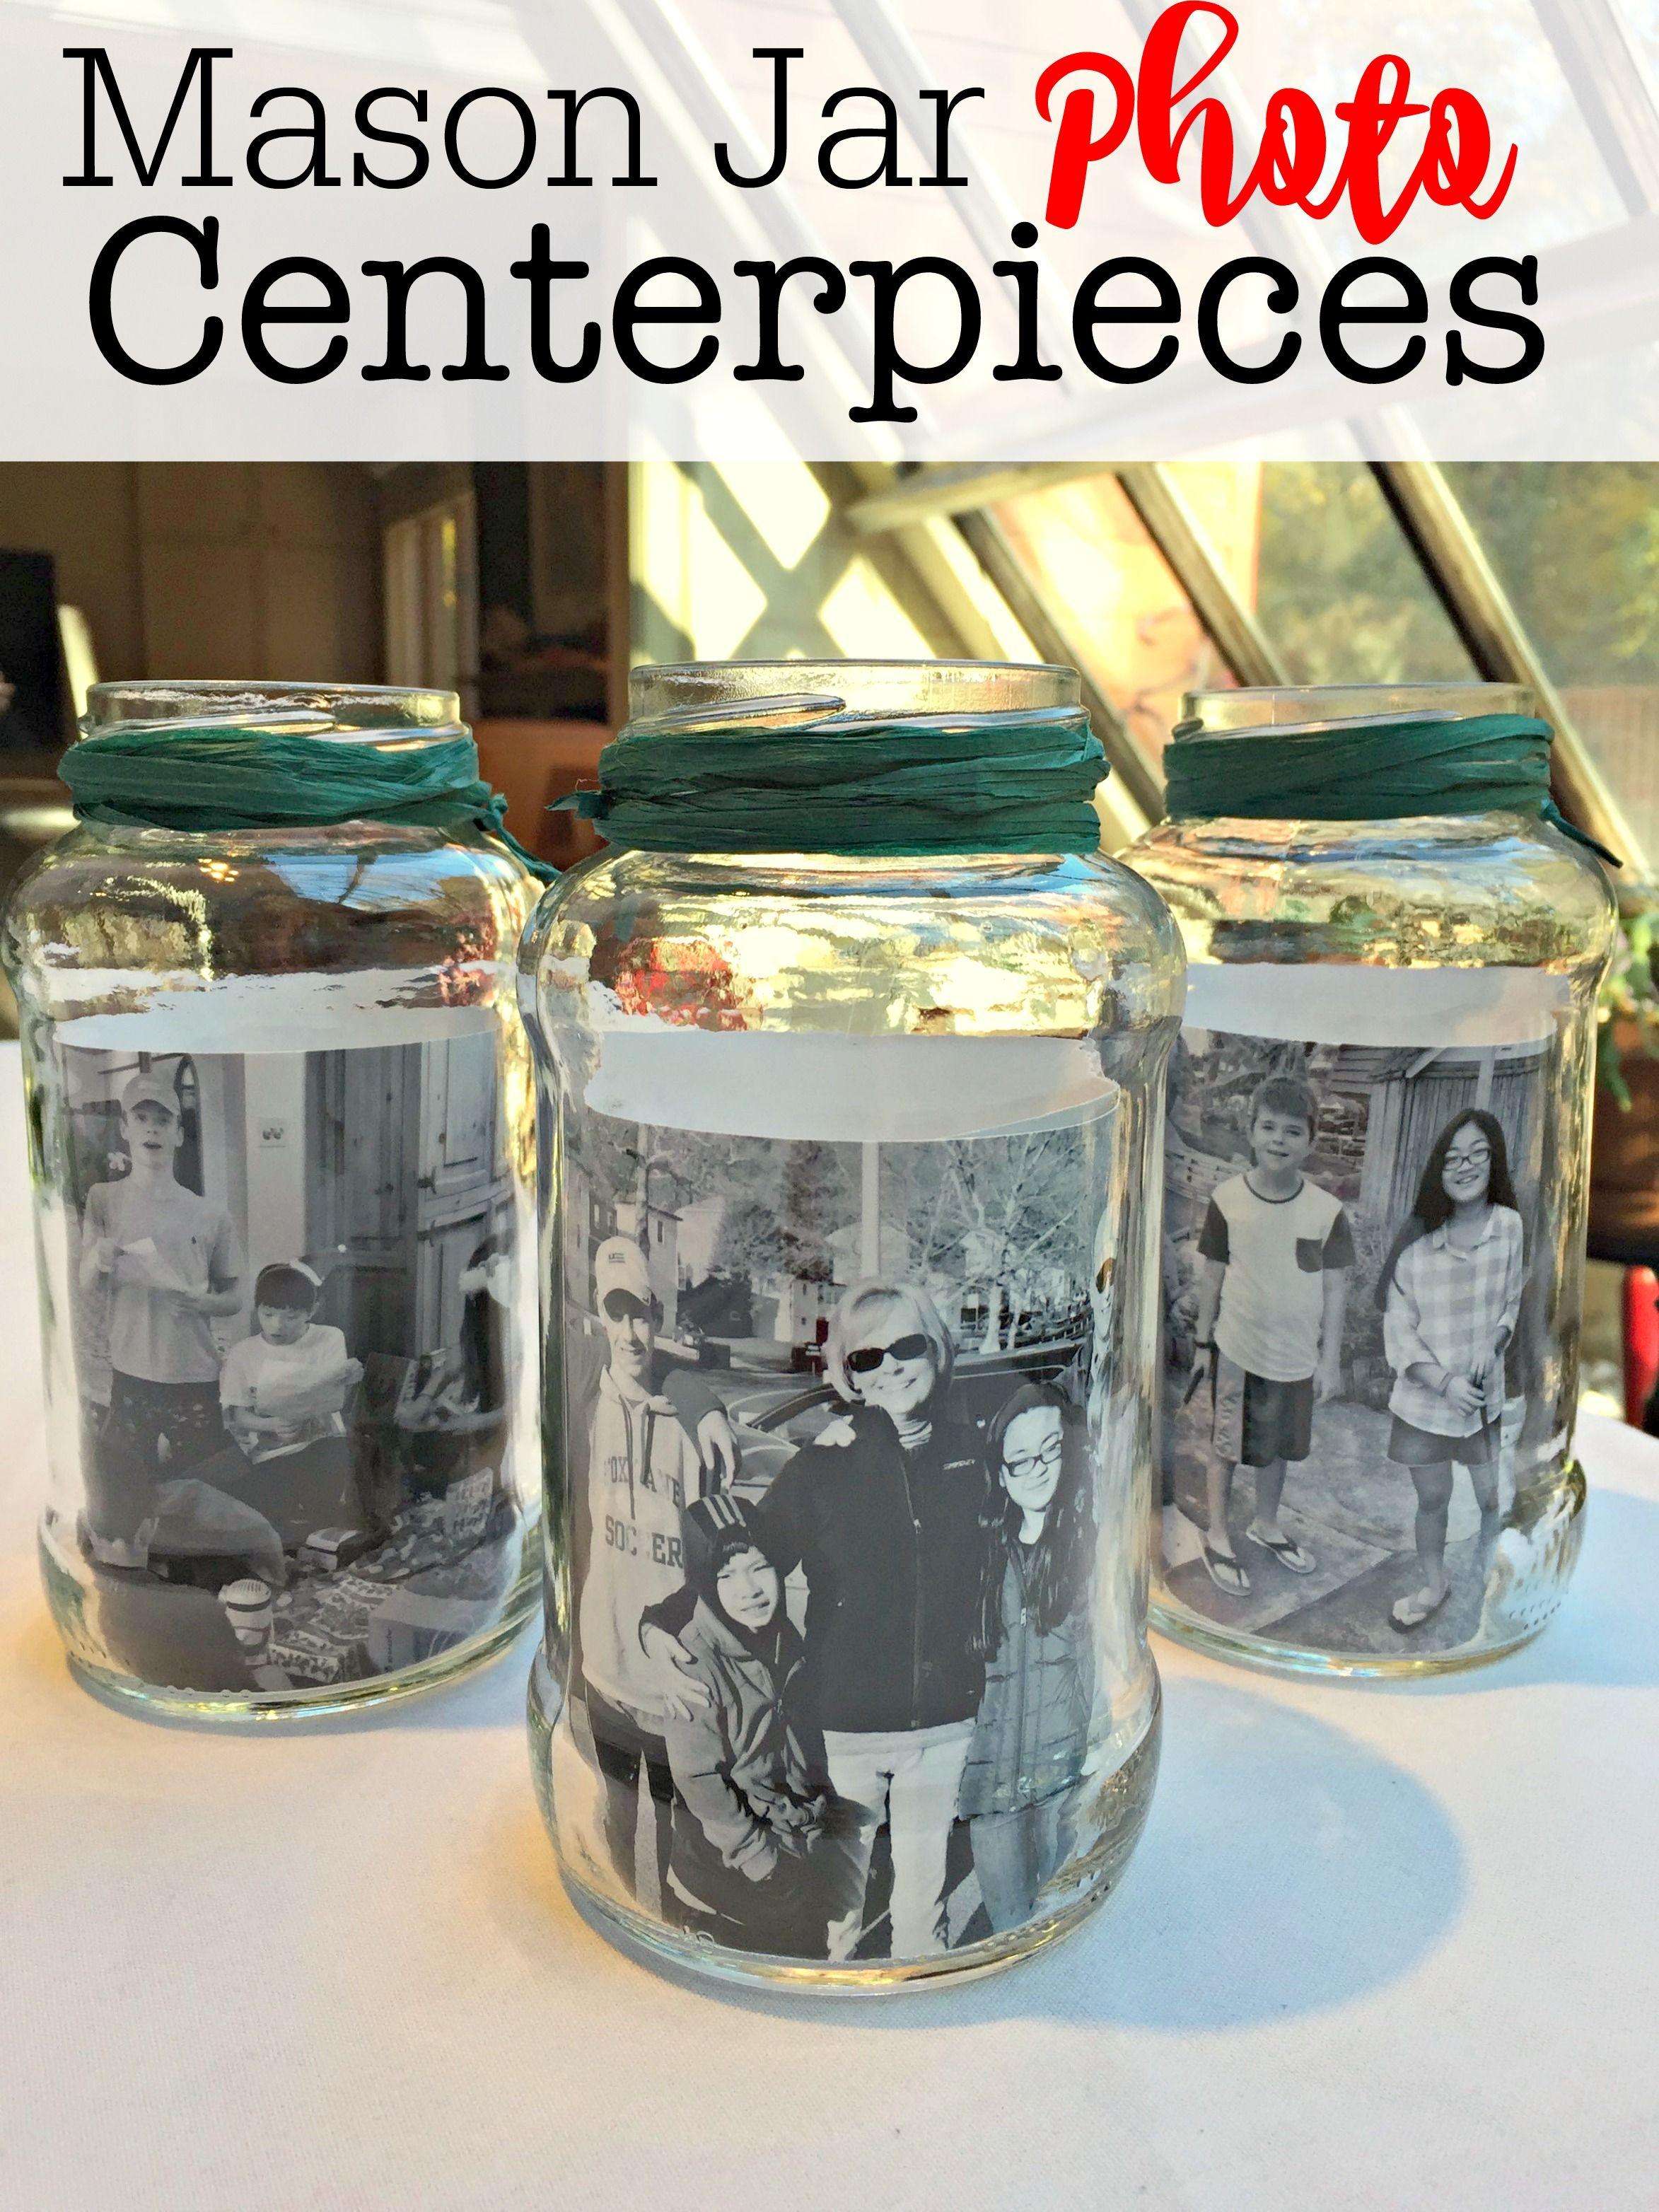 Mason Jar Photo Centerpieces Mason Jar Photo Mason Jar Diy Photo Centerpieces